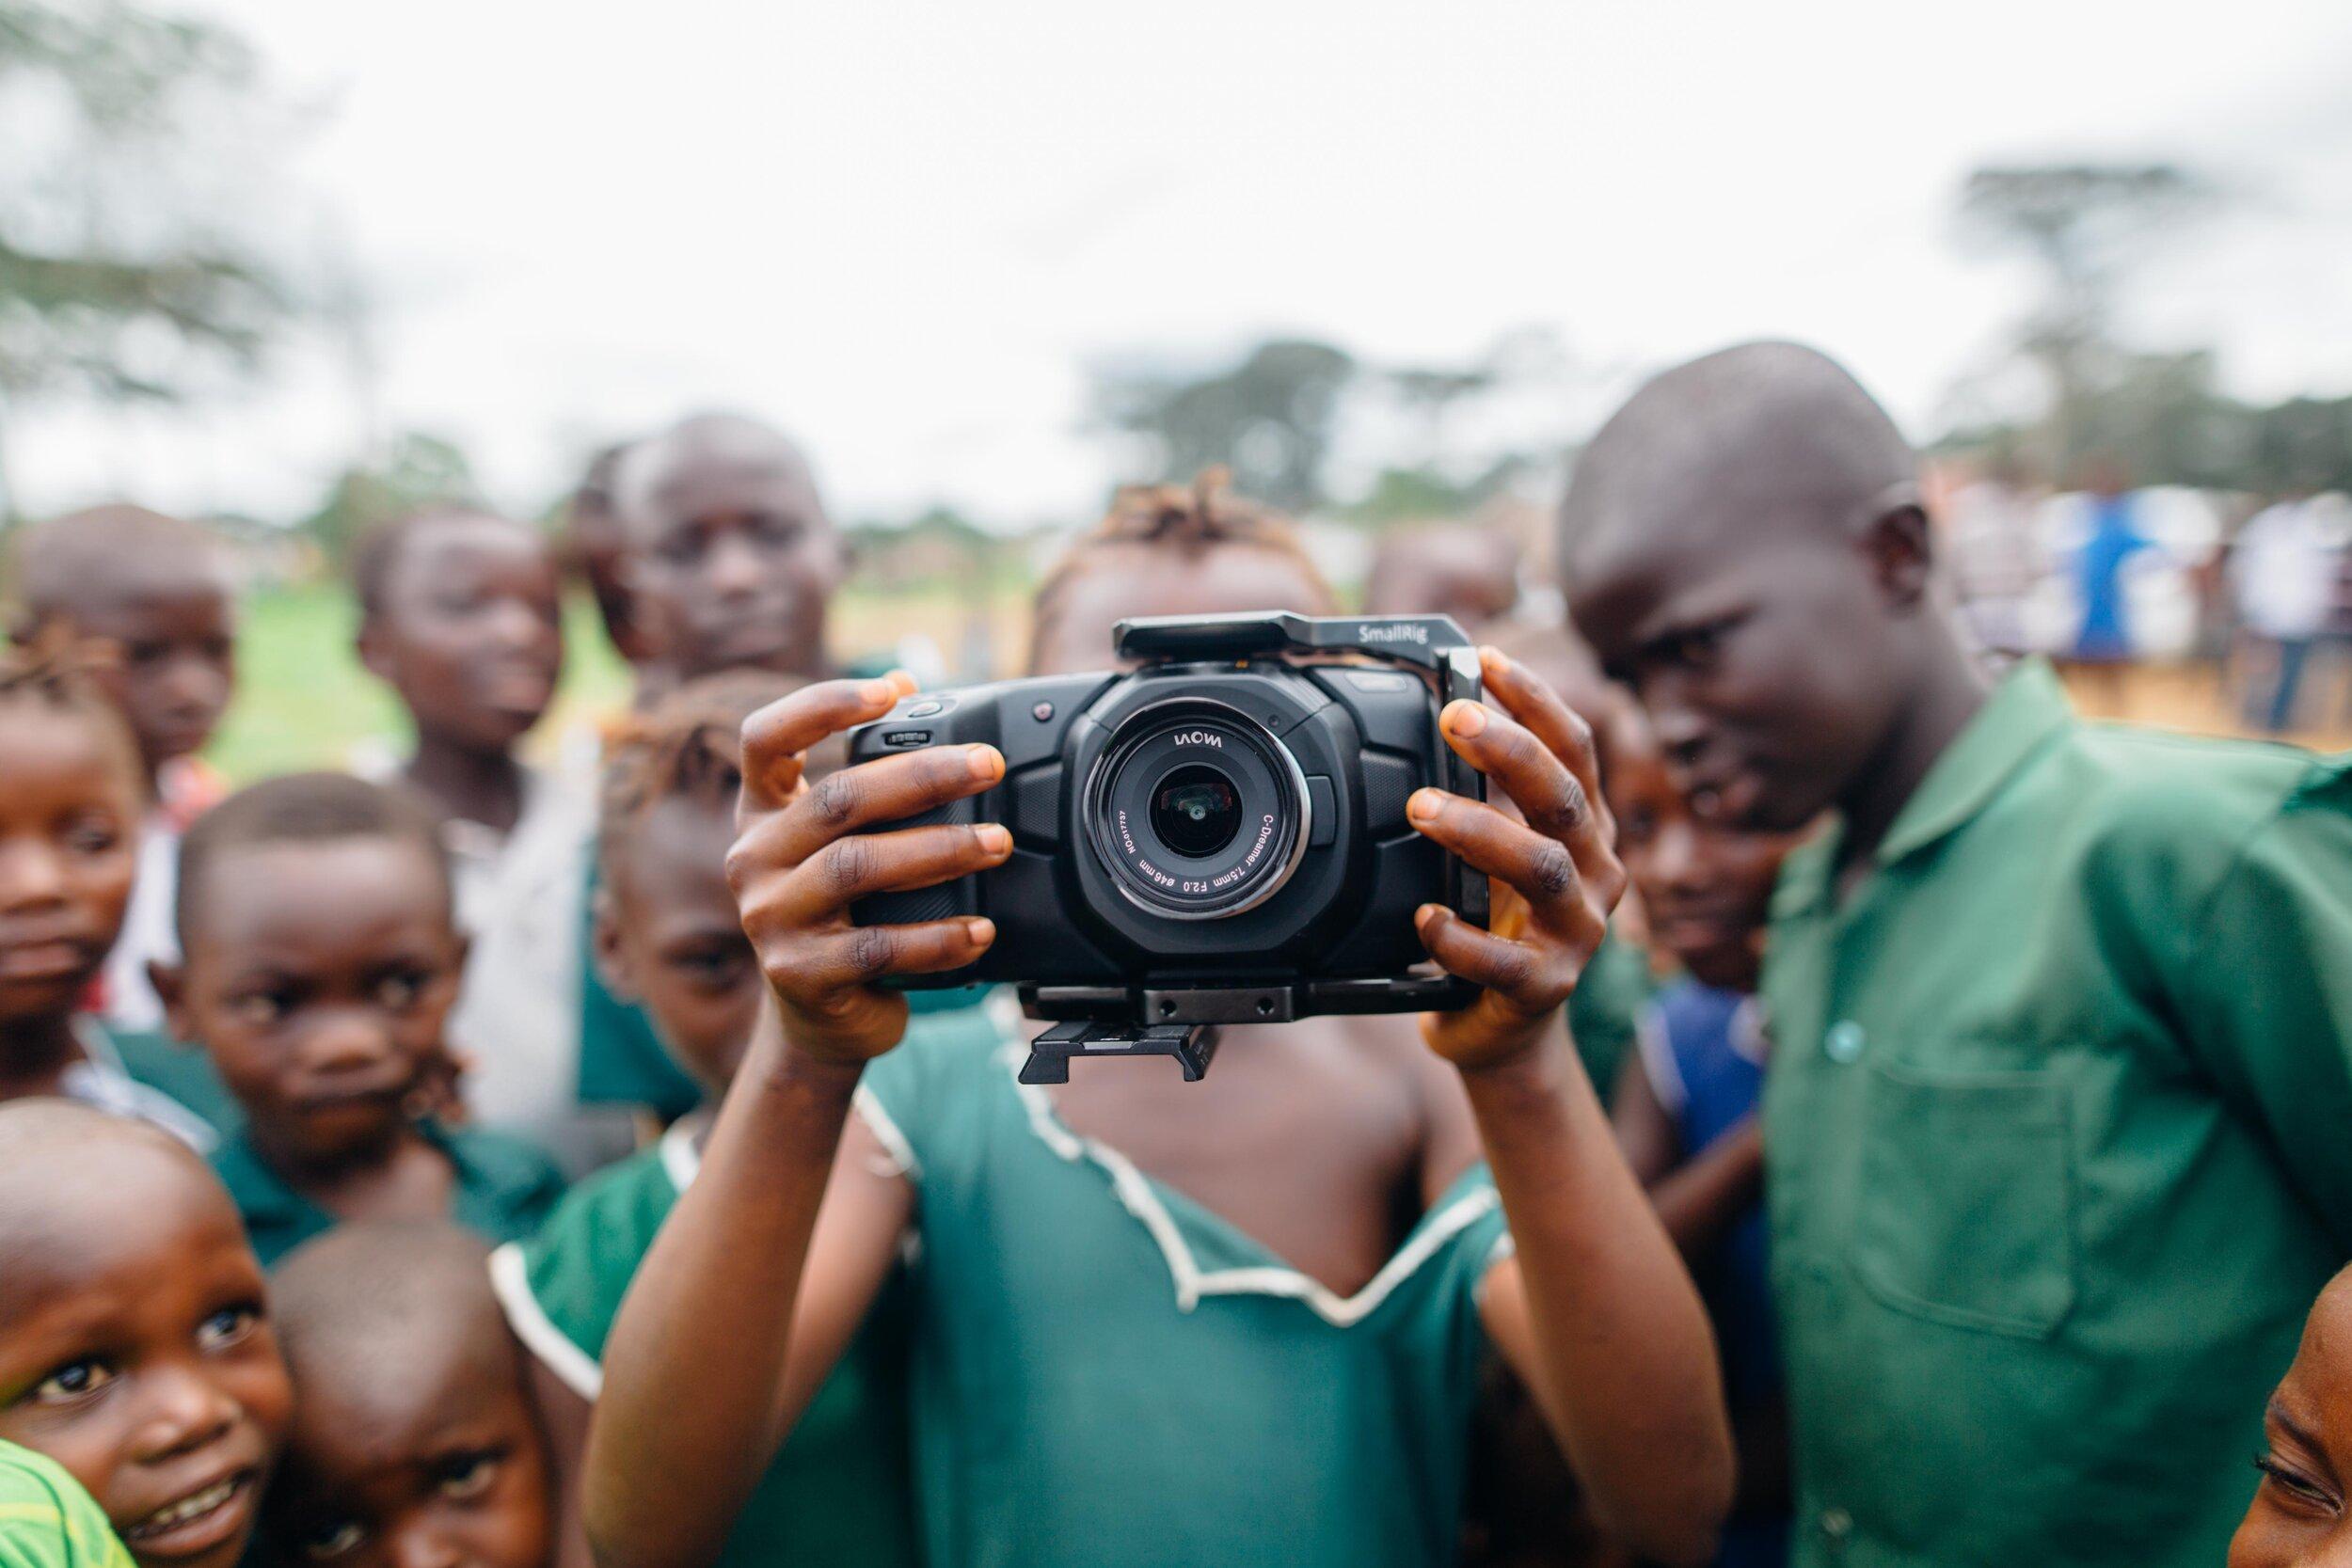 camera-children-daylight-3030370.jpg